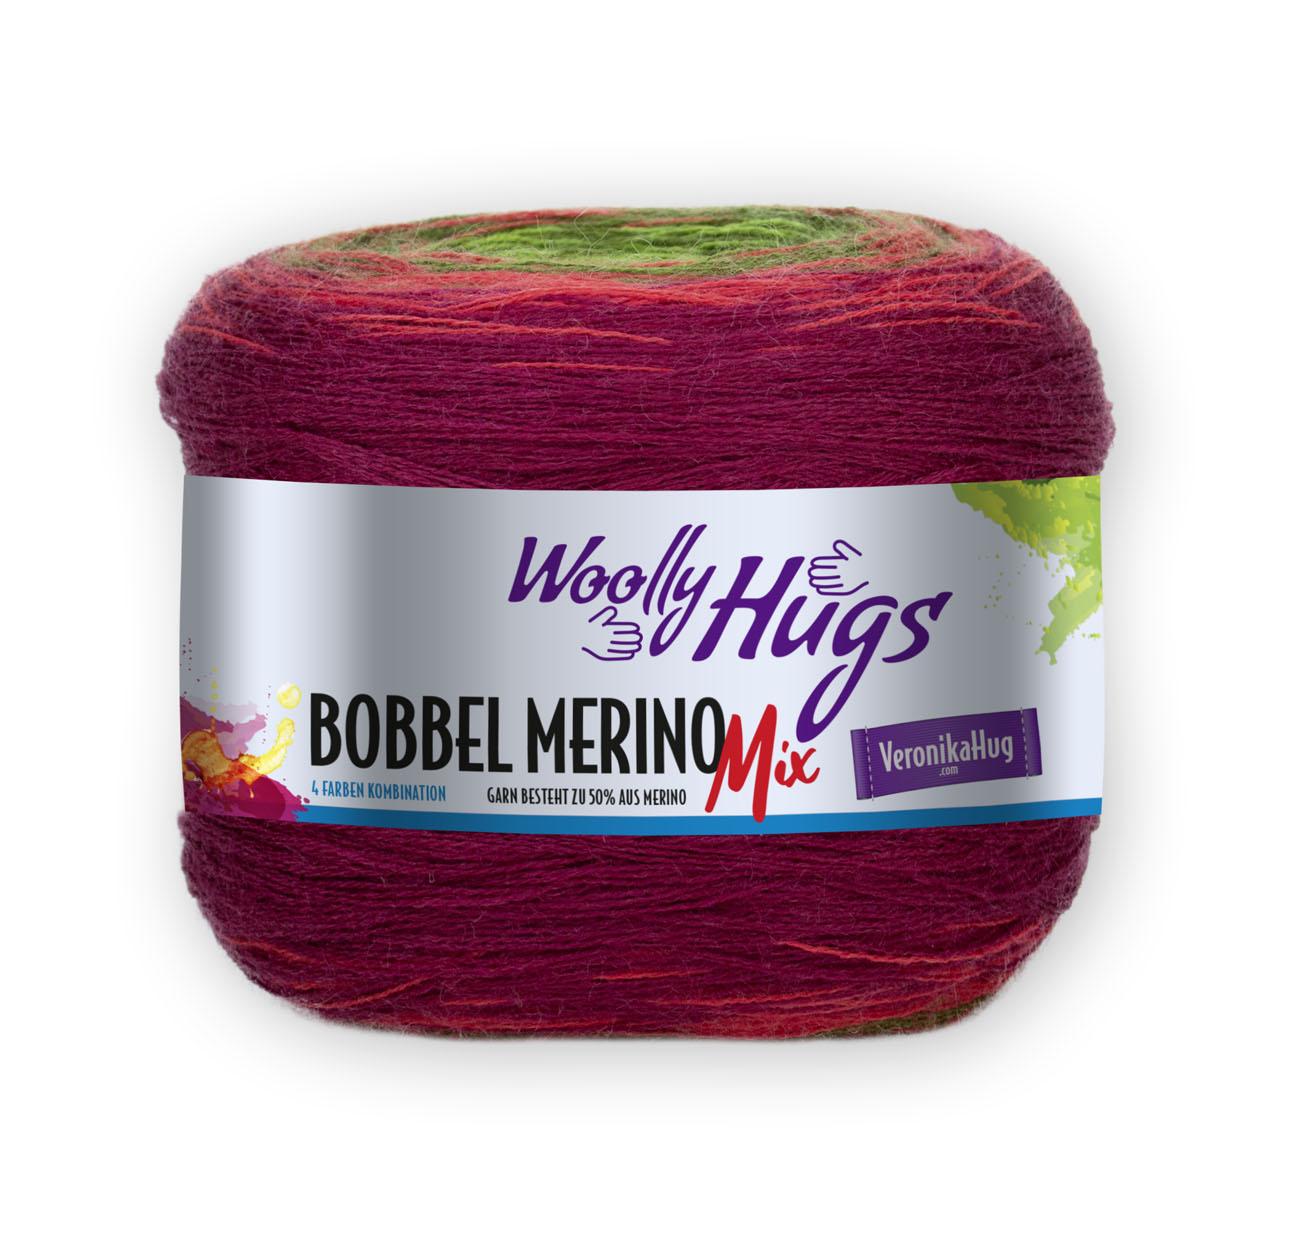 Woolly Hugs Bobbel Merinomix 701